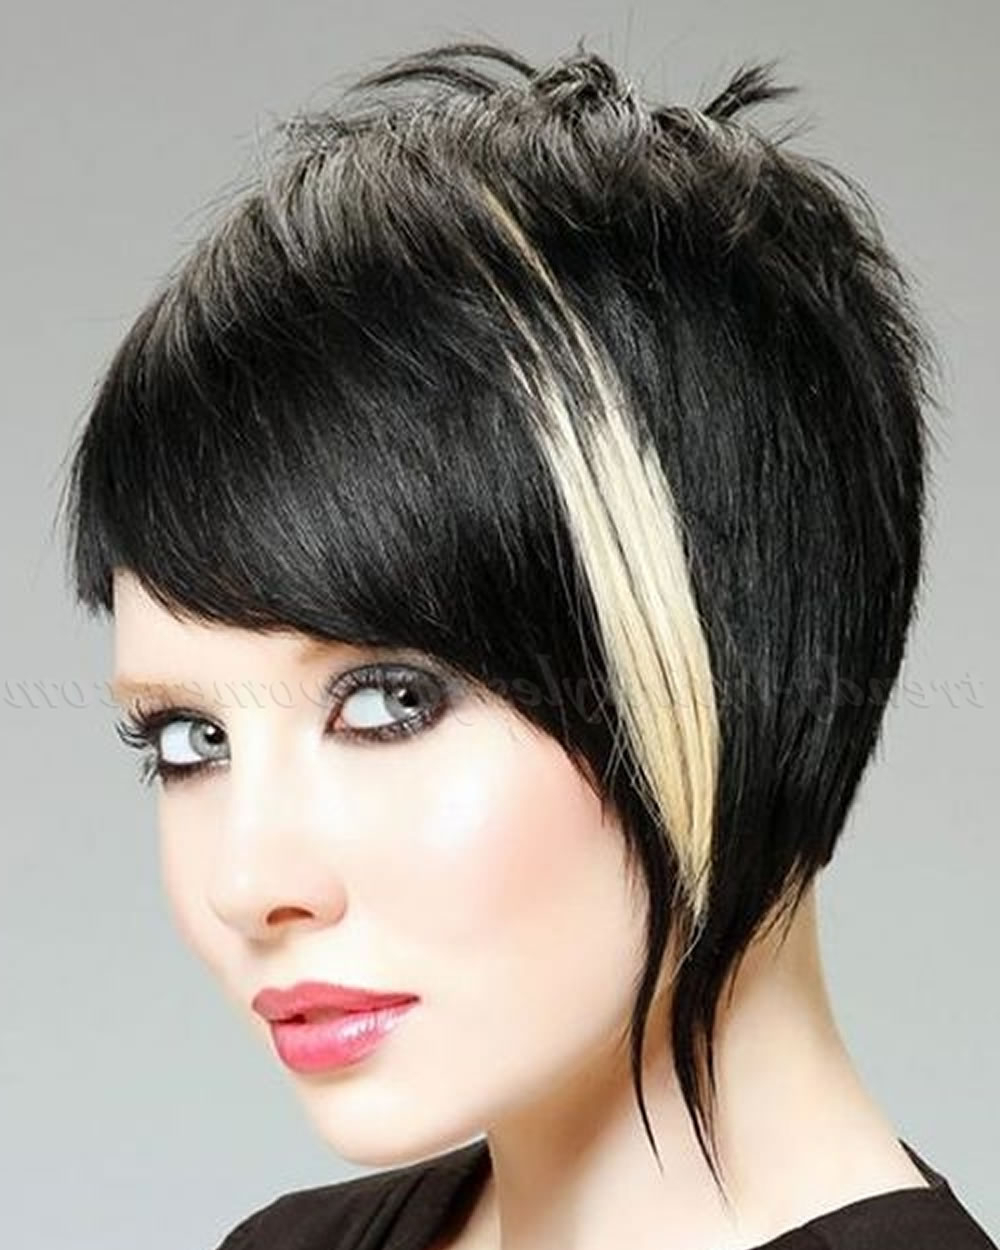 Asymmetrical Short Hair 2018 – 33 Haute Short Hairstyles & Haircuts Pertaining To Symmetrical Short Haircuts (Gallery 7 of 25)